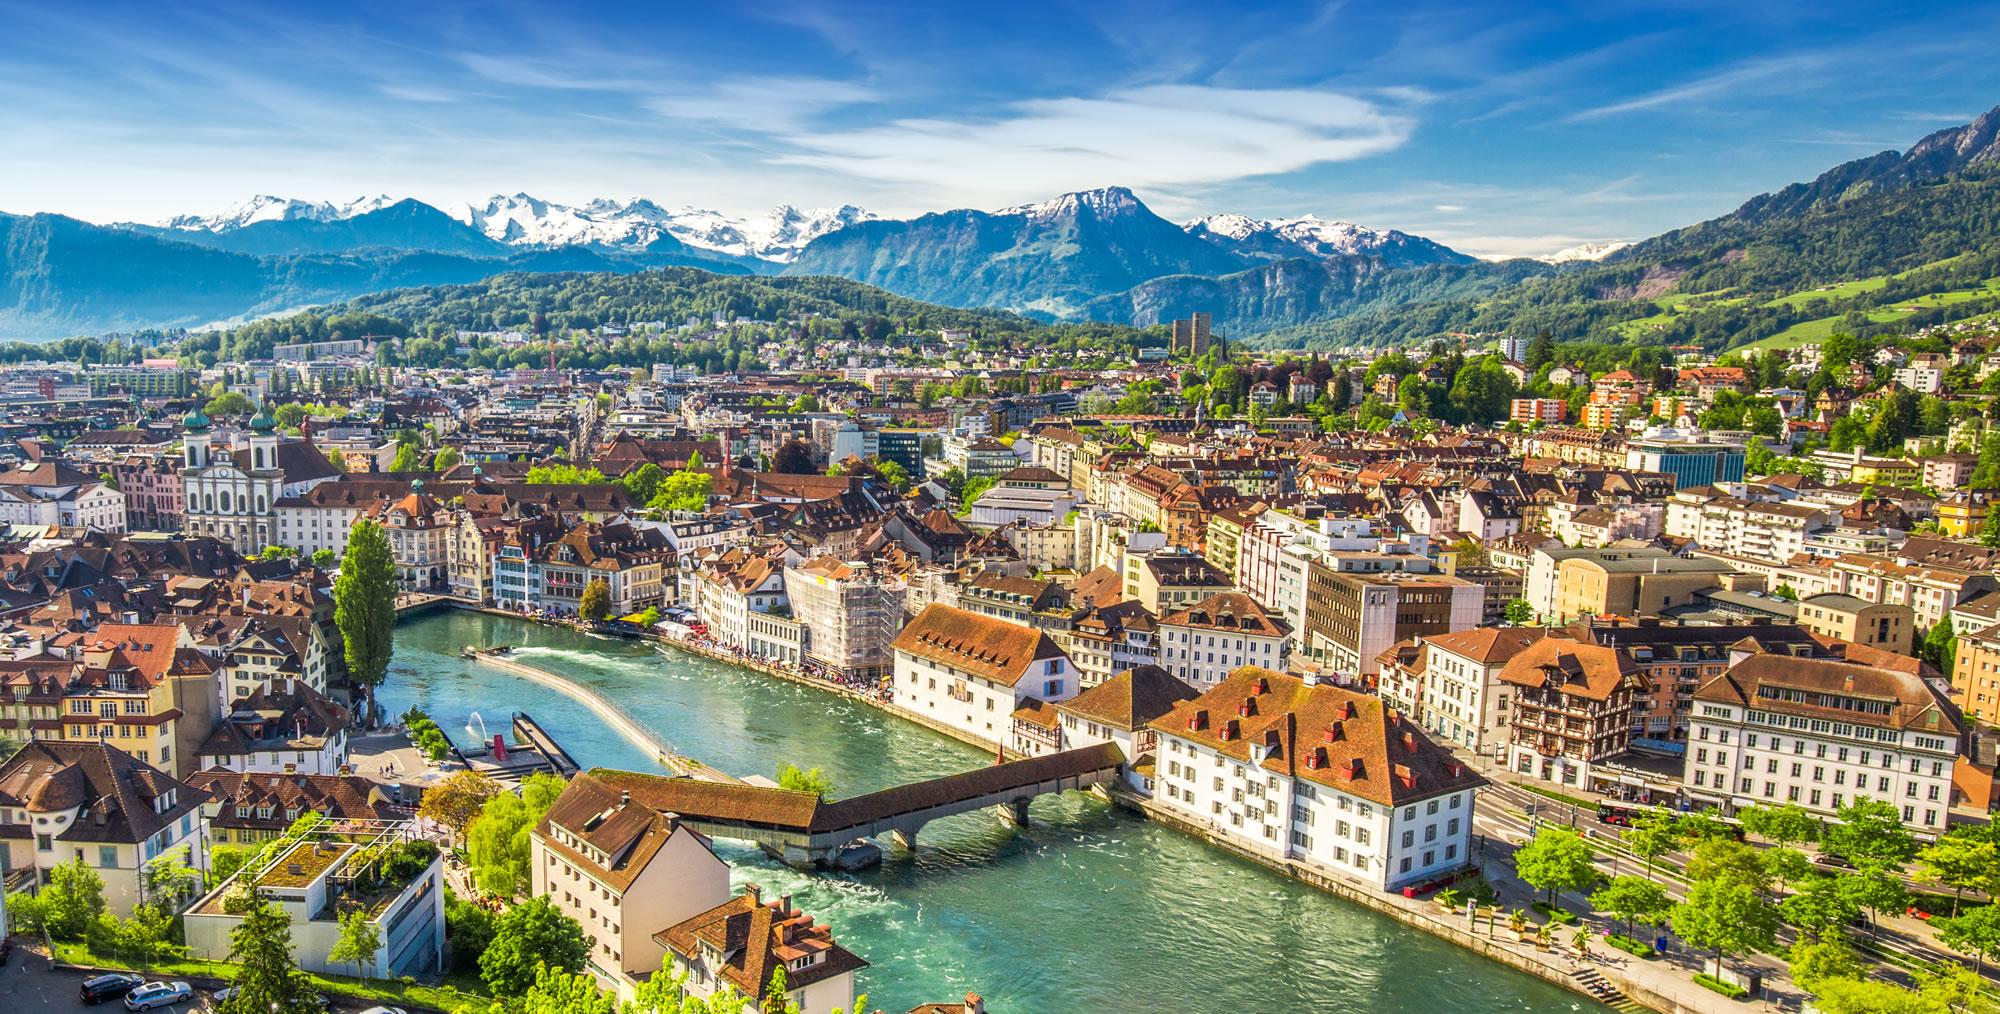 Pilatus Mountain Luzern, Switzerland